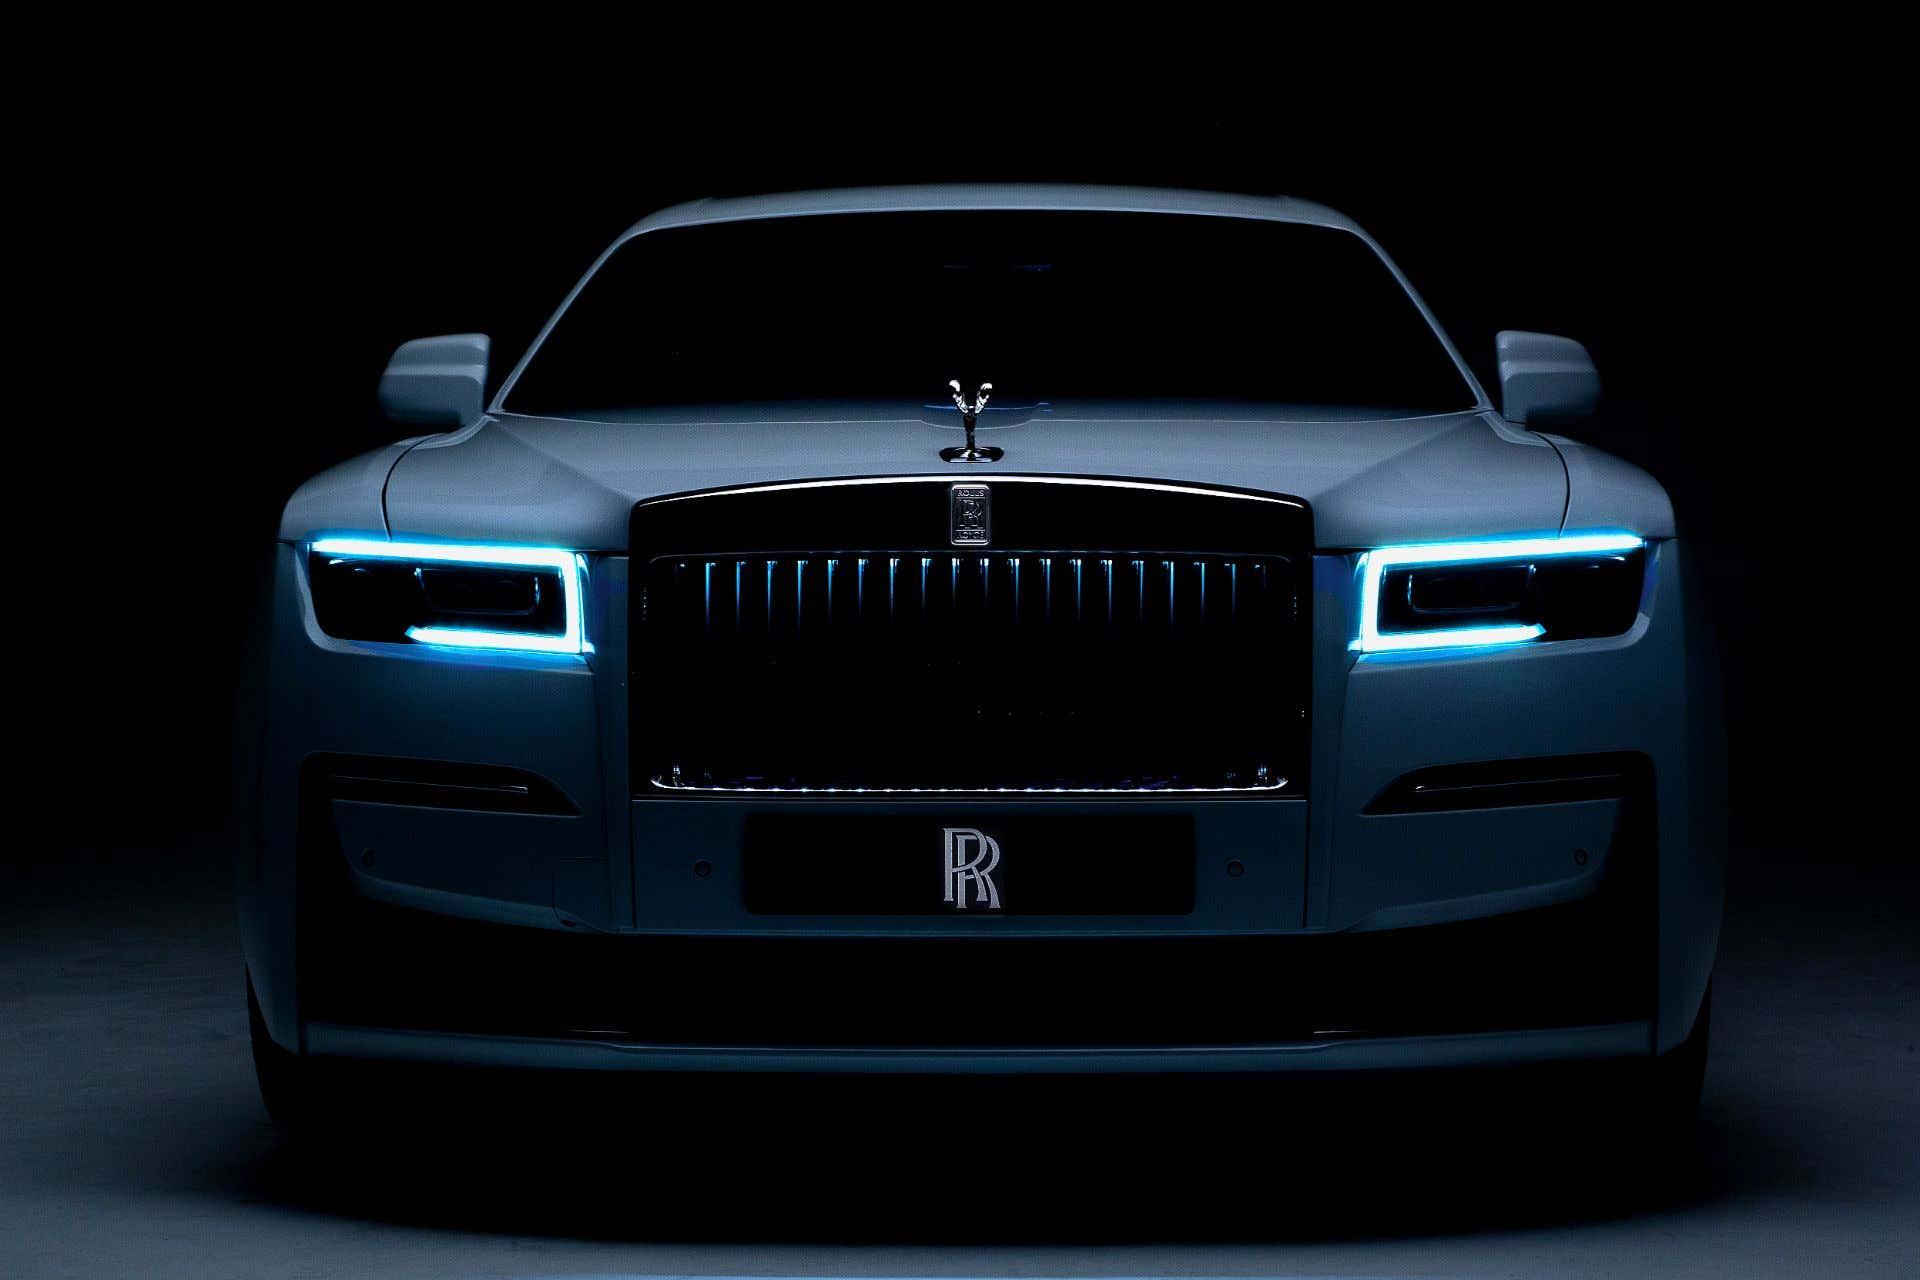 The 2021 Rolls-Royce Ghost Is a V12 Minimalist Luxury ...